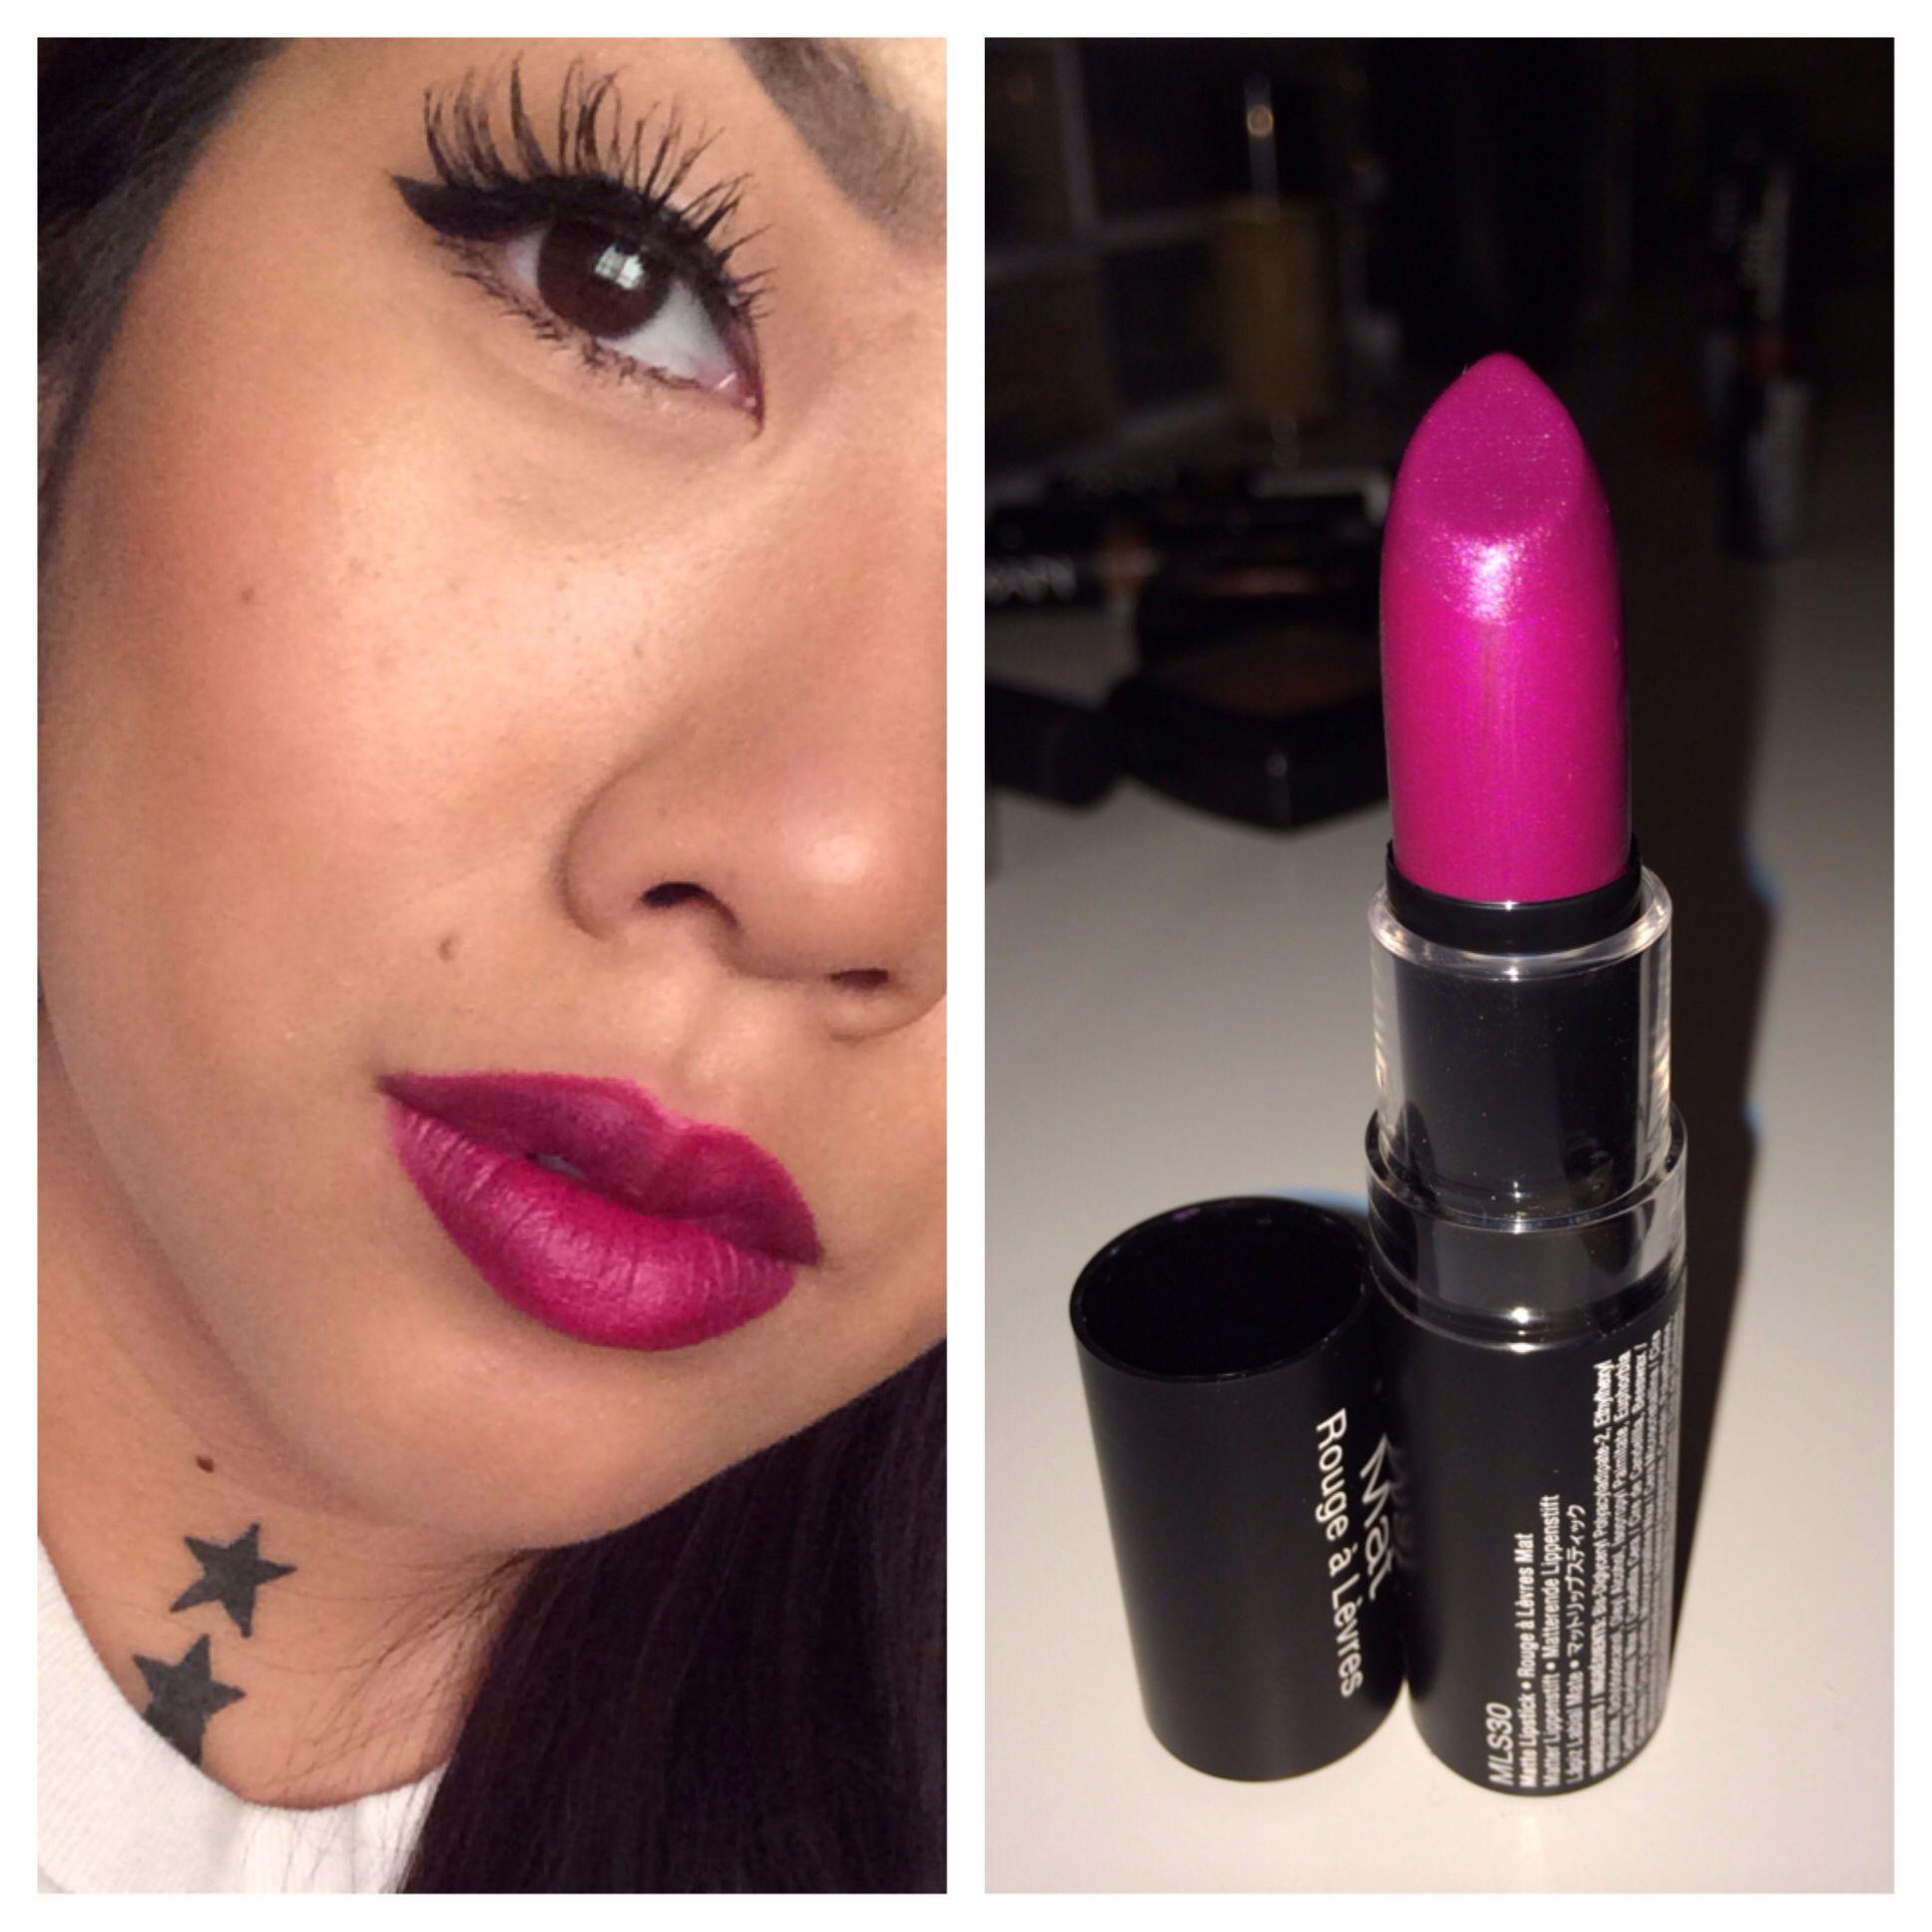 NYX matte lipstick in Aria | LIPPIES! LIPSTICKS! | Pinterest ...